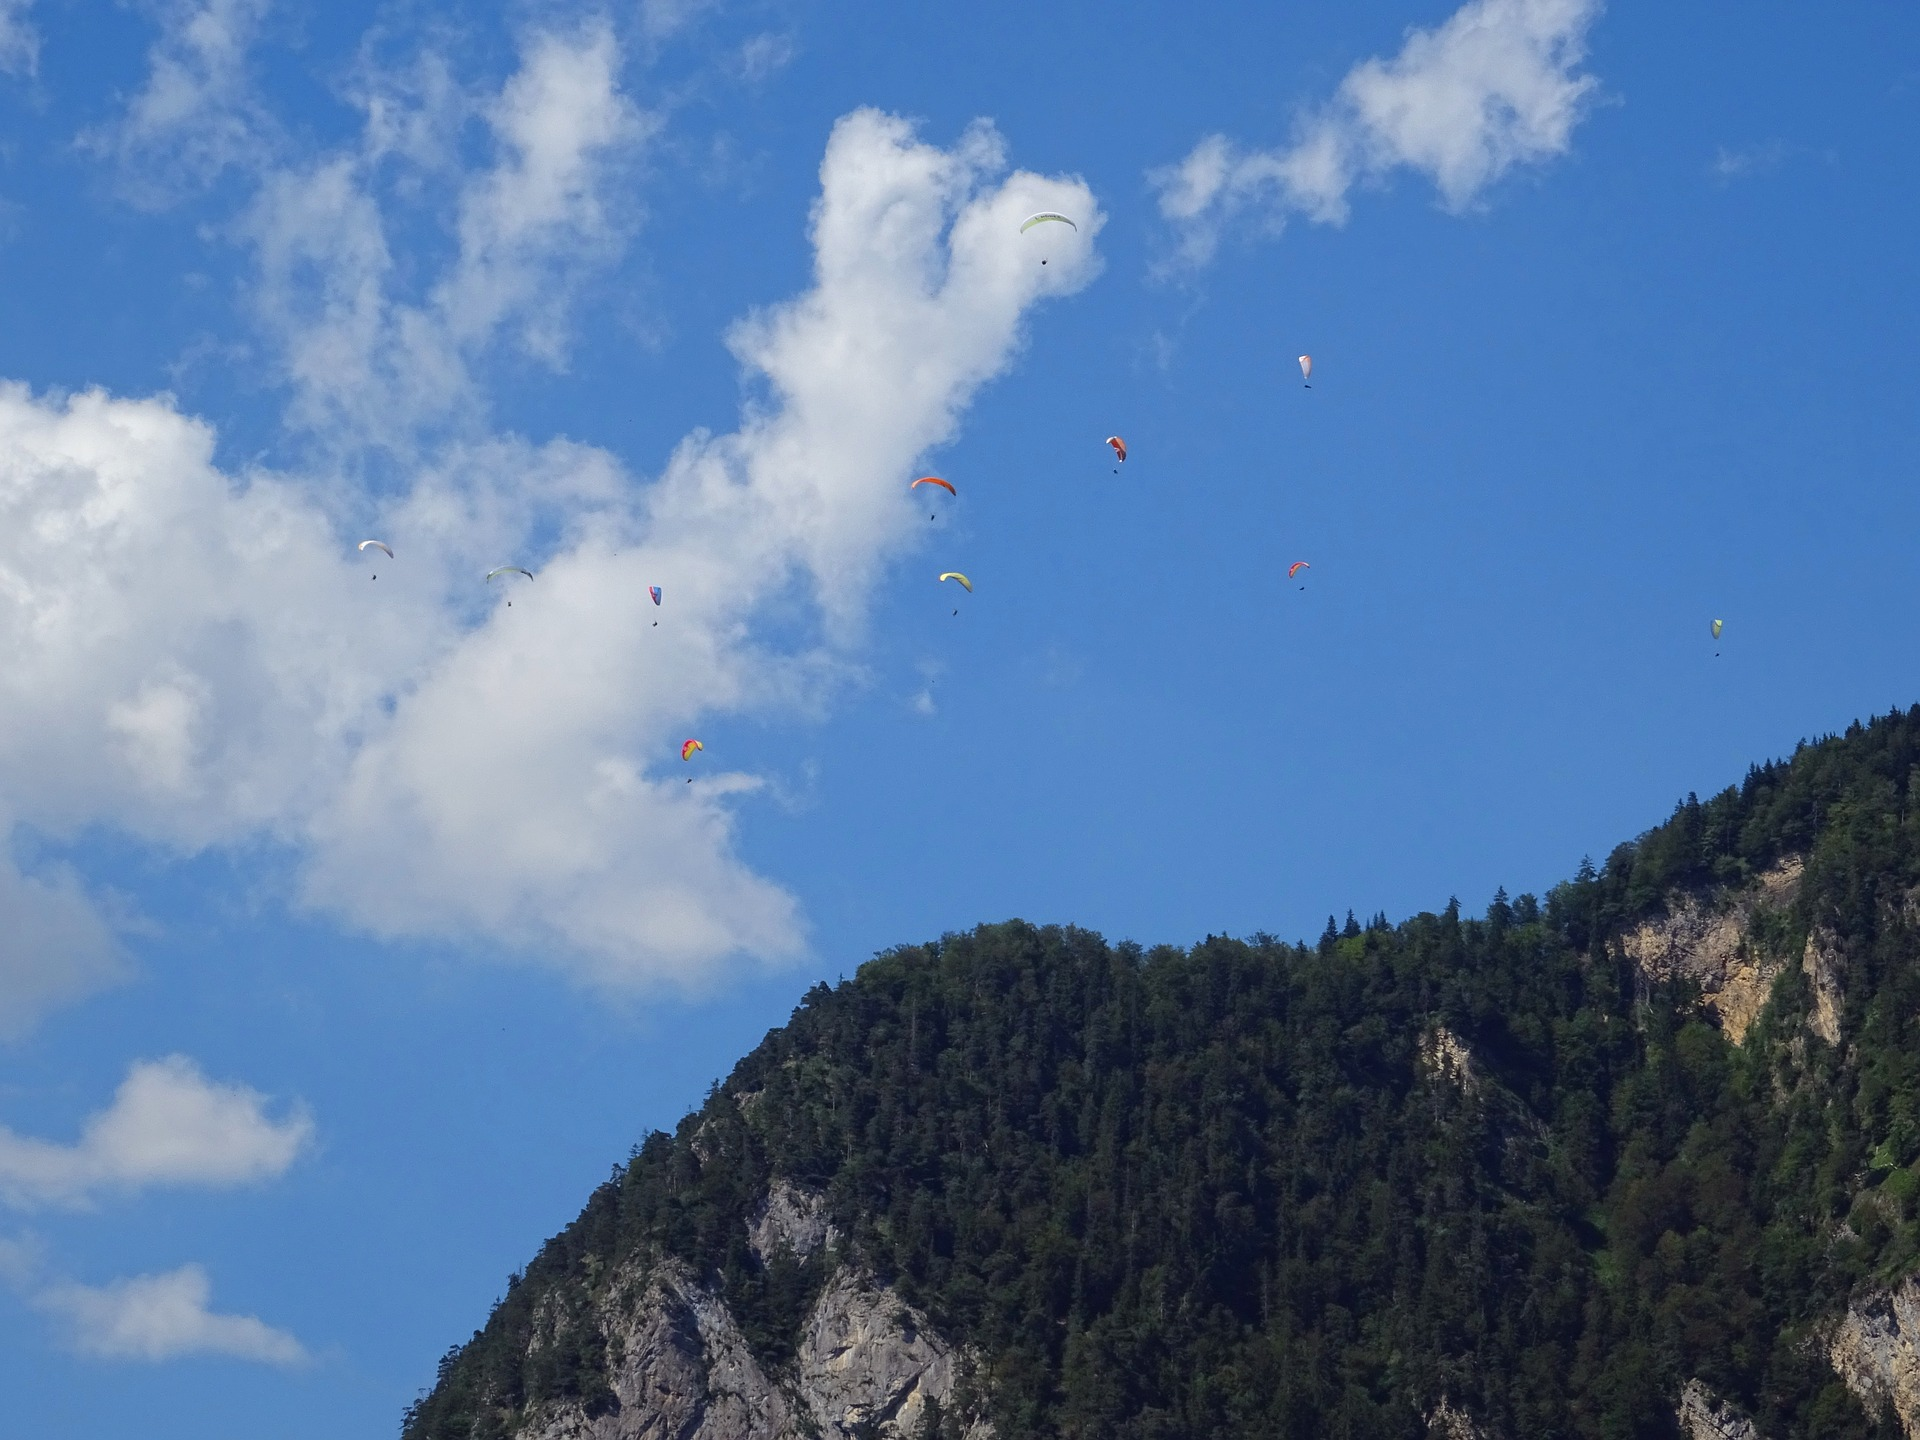 paragliding things to do in Intertaken